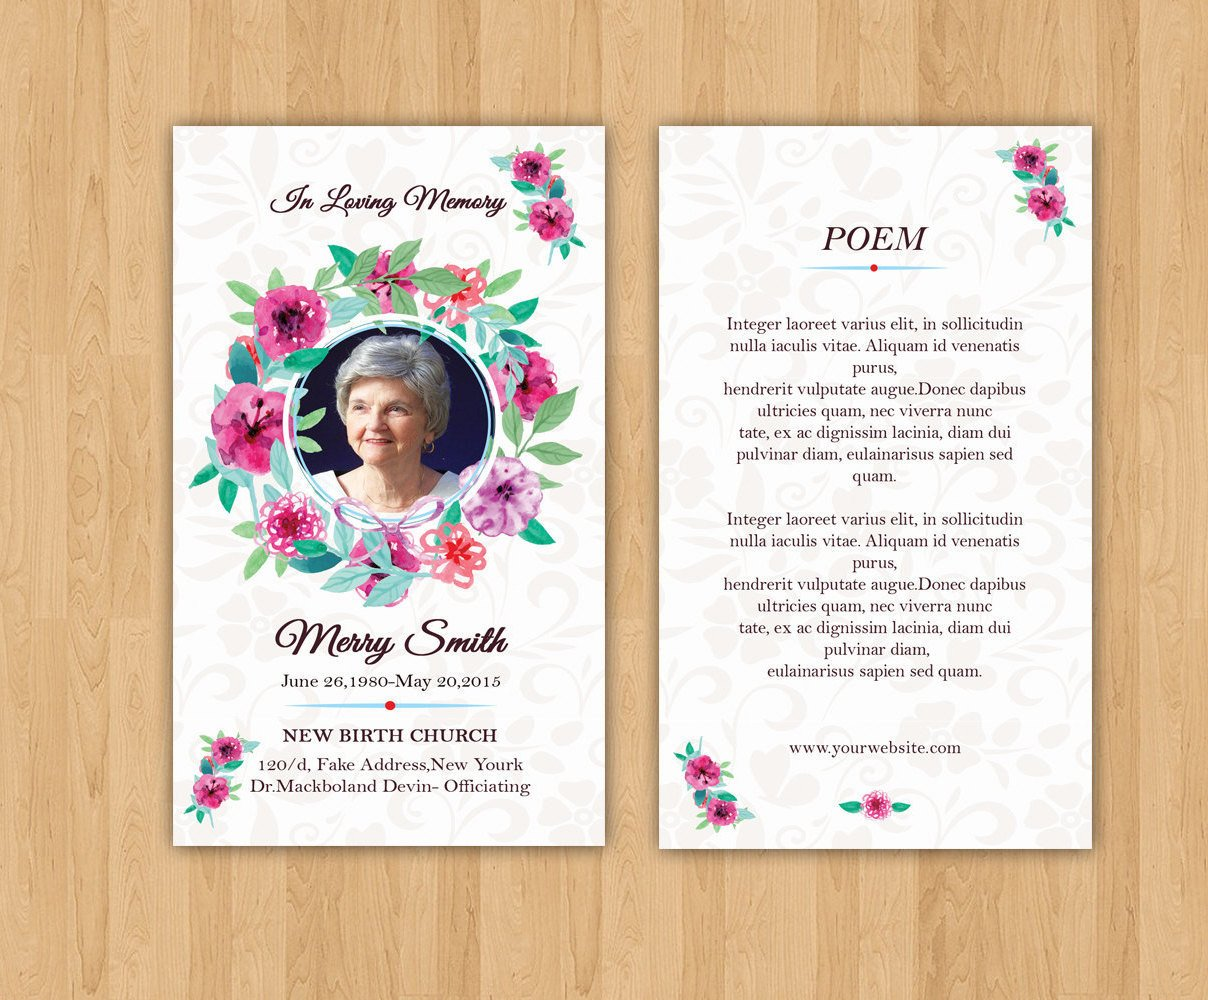 Prayer Card Template Free Funeral Prayer Card Template Editable Ms Word & Shop